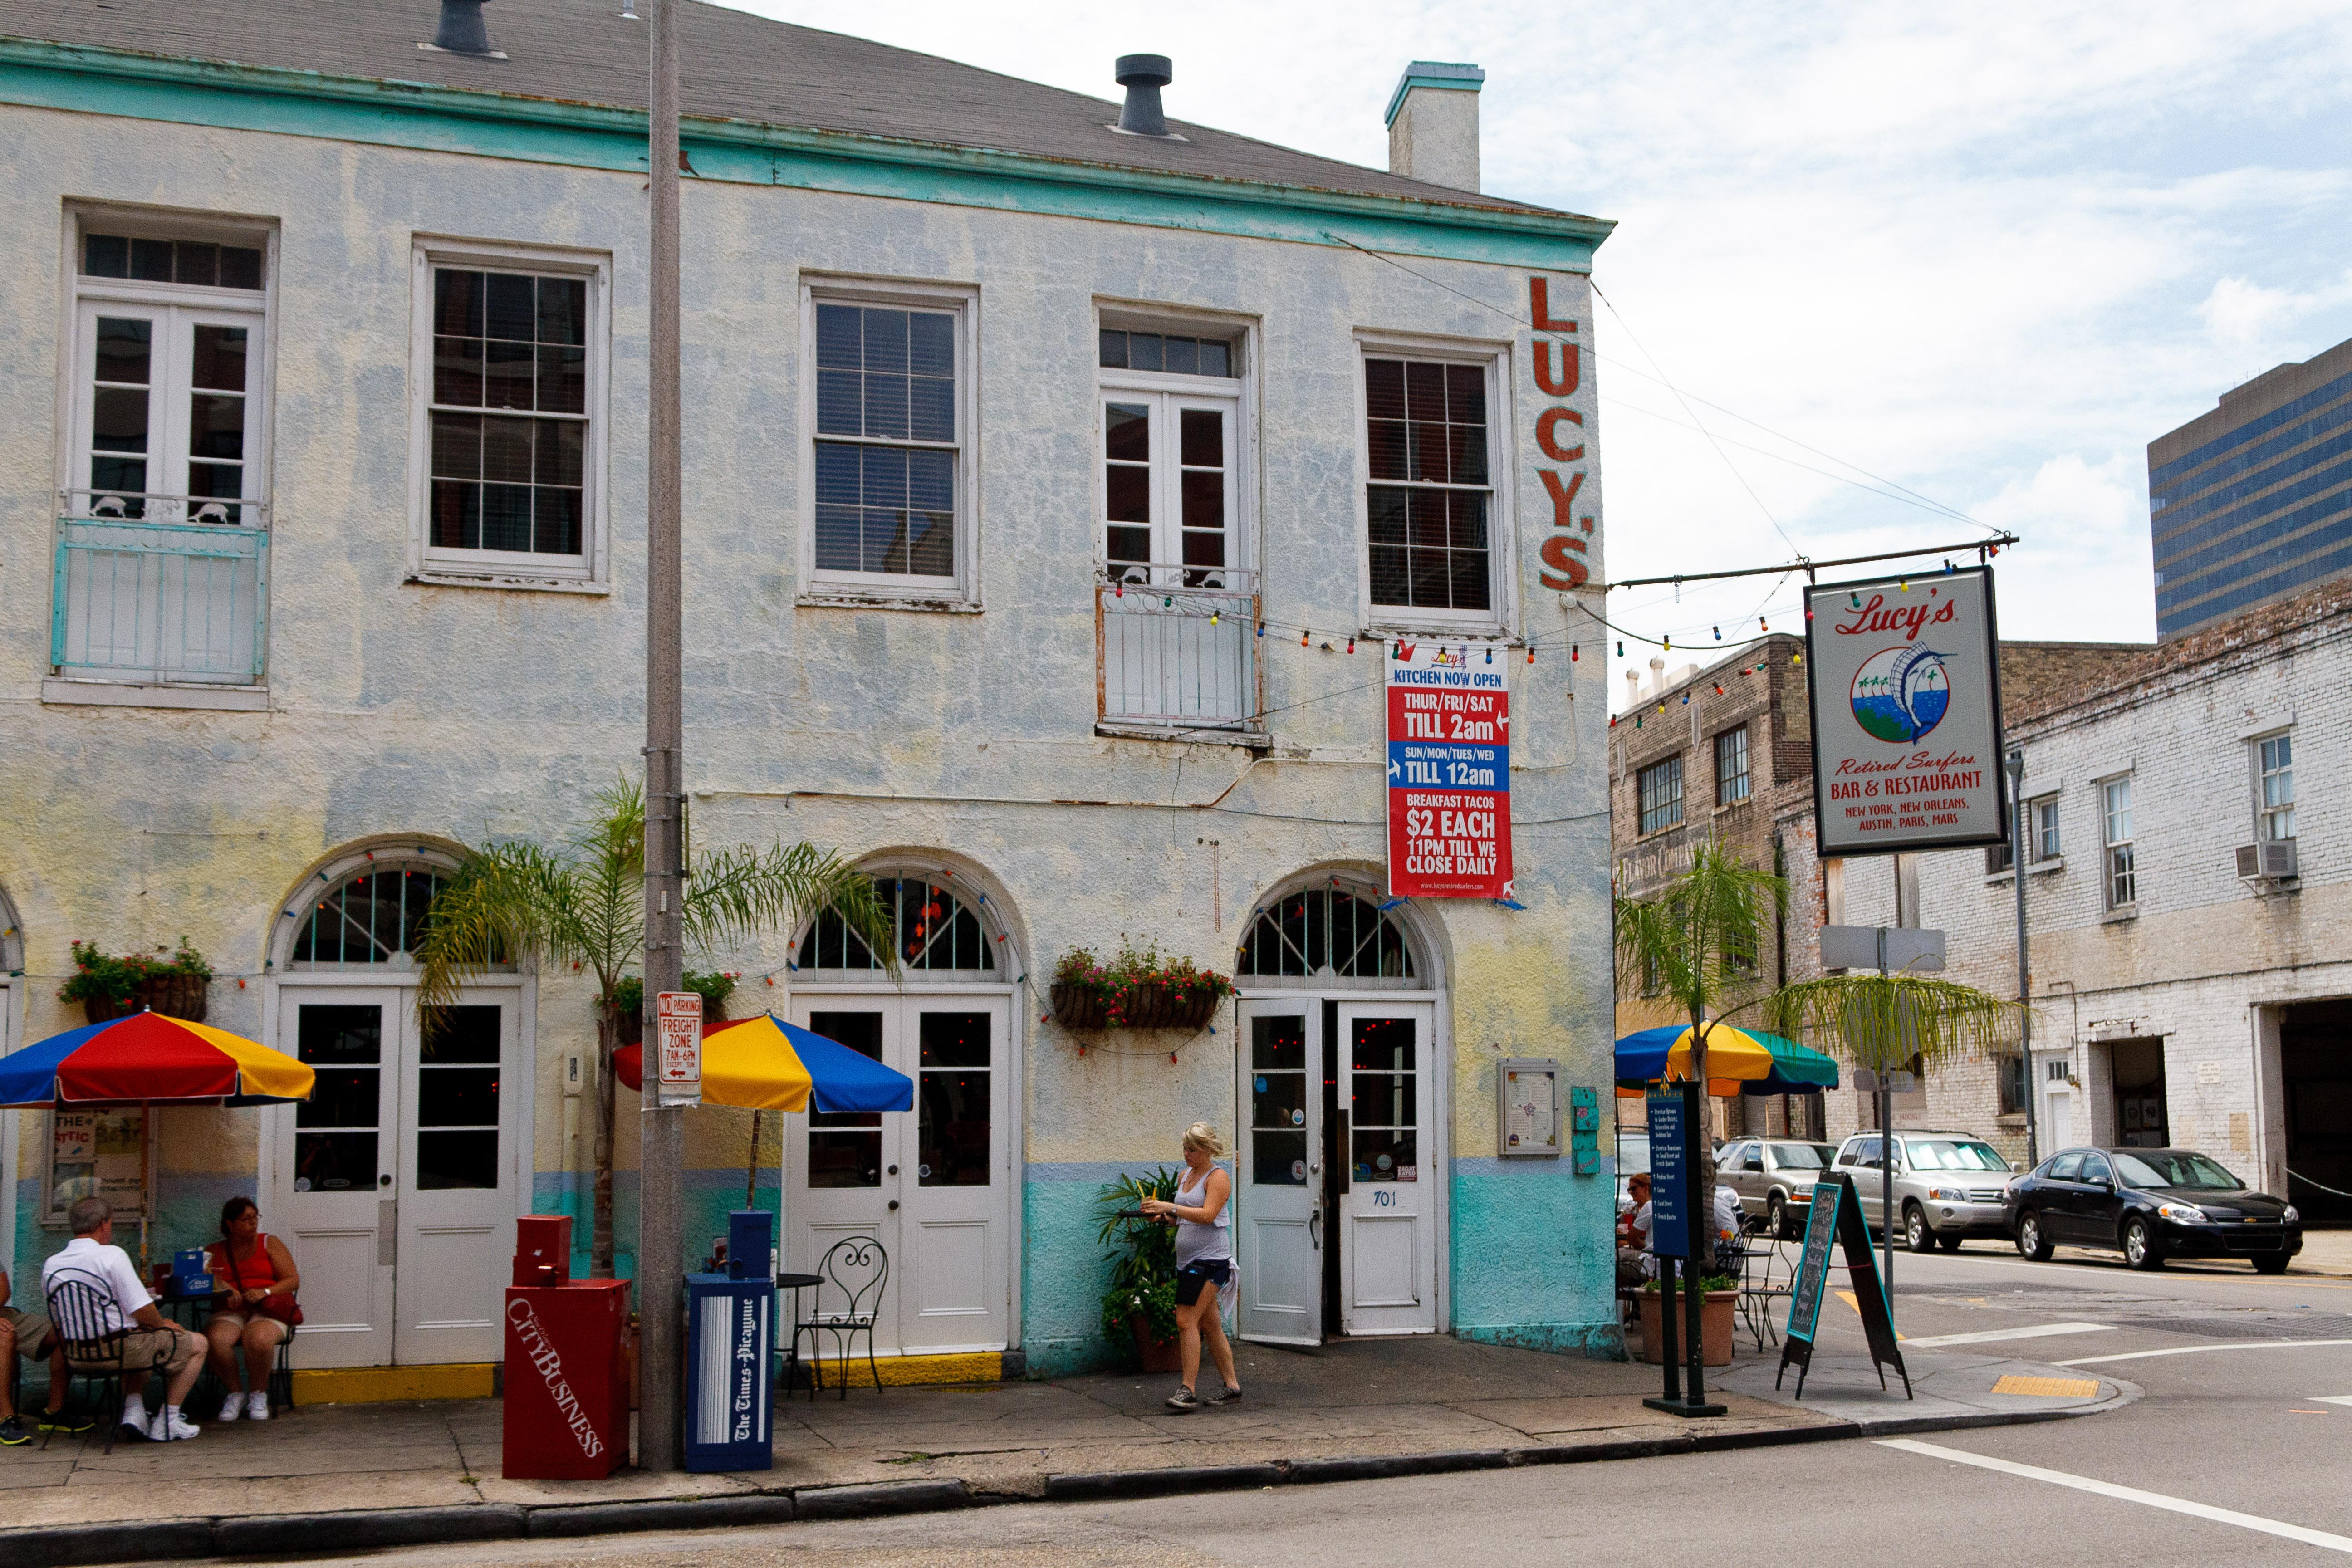 File:Lucy's Retired Surfers Bar & Restaurant jpg - Wikimedia